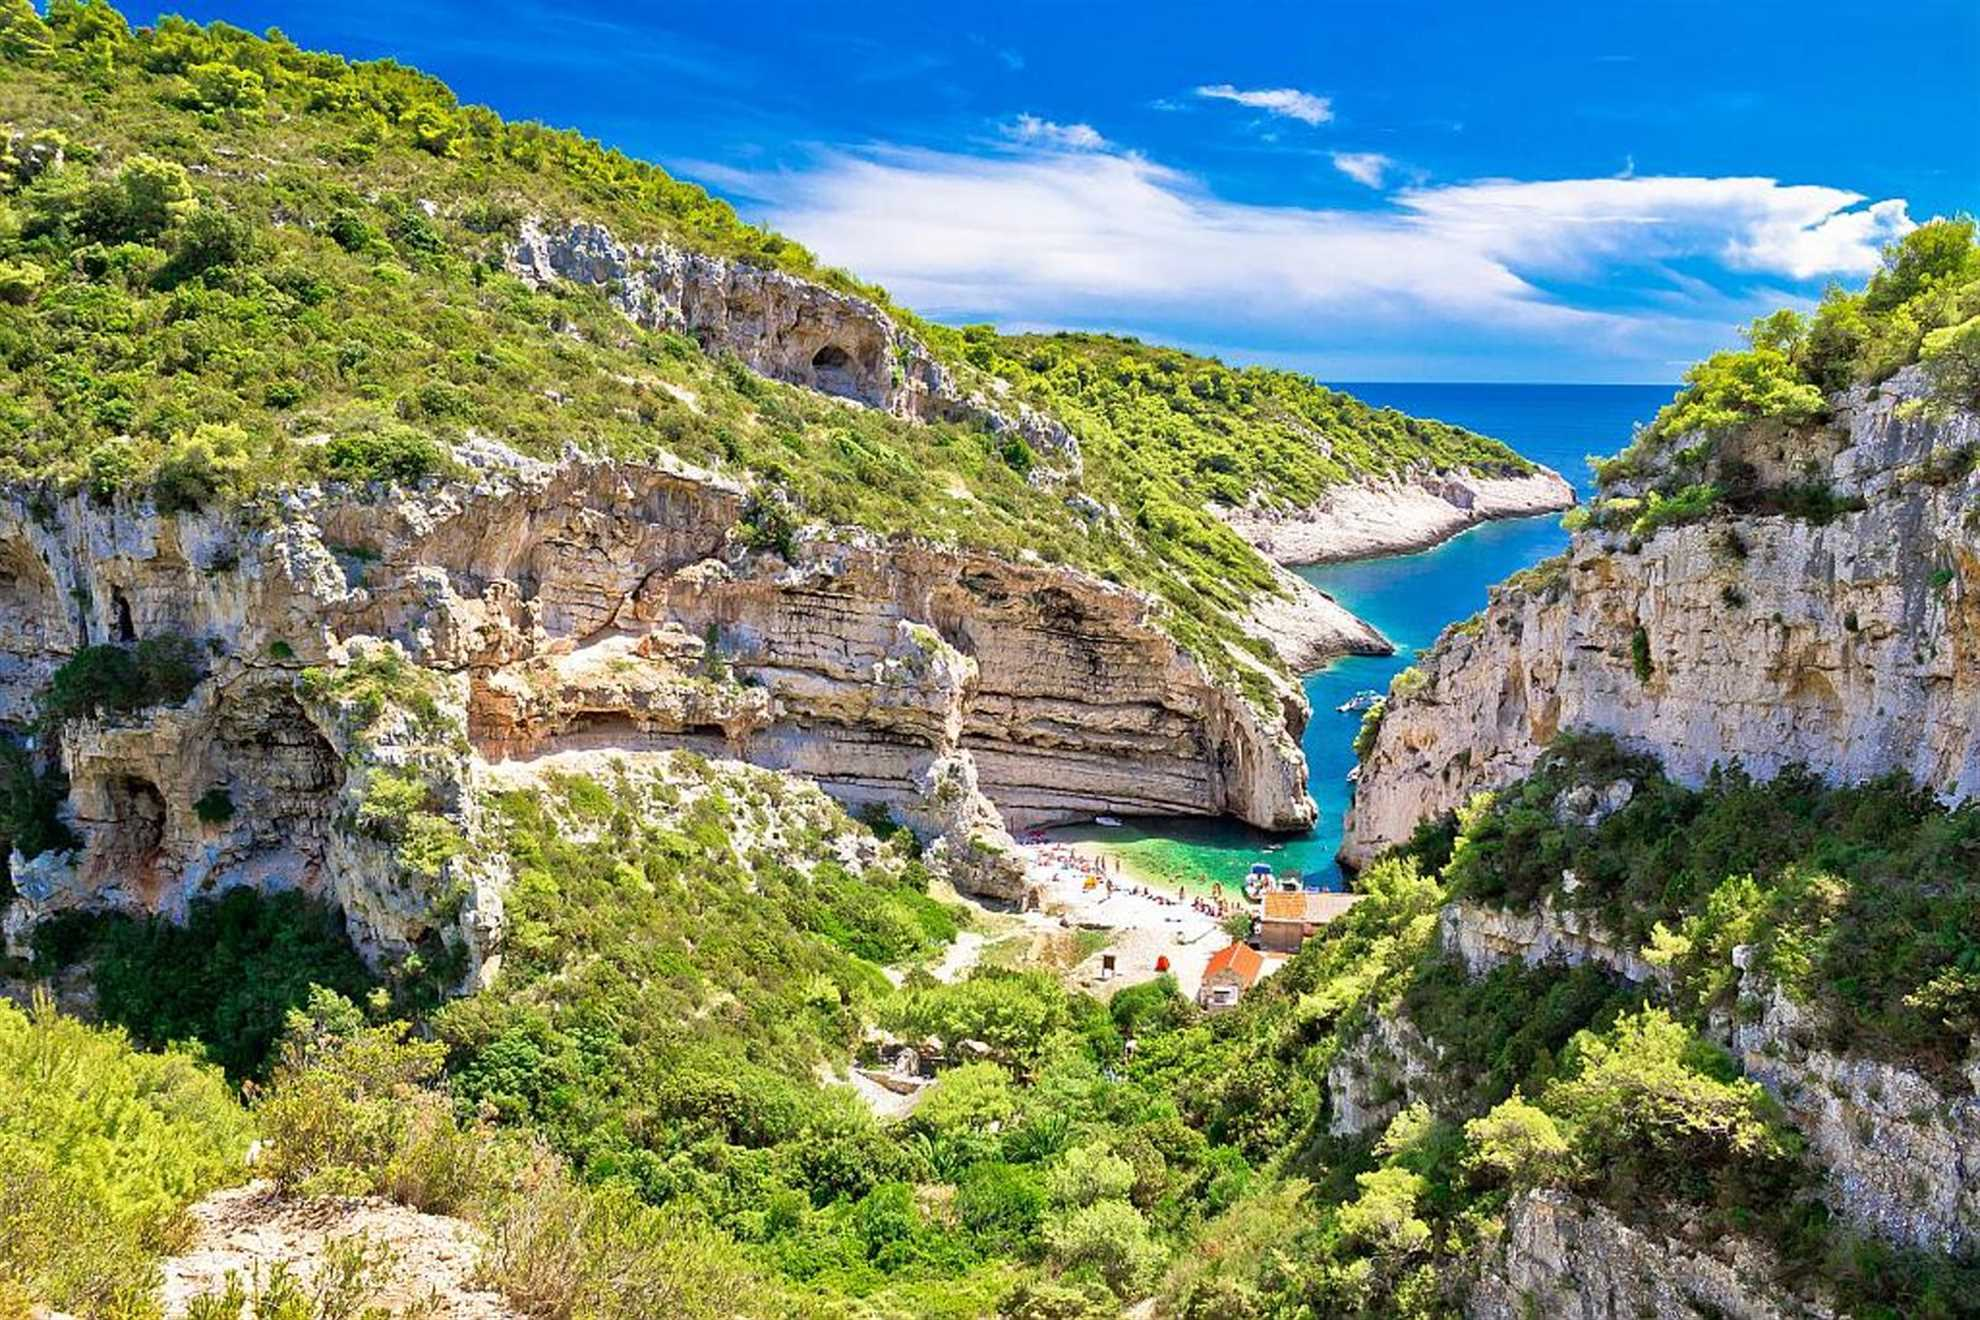 Mala Stiniva Bay, Vis, Croatia